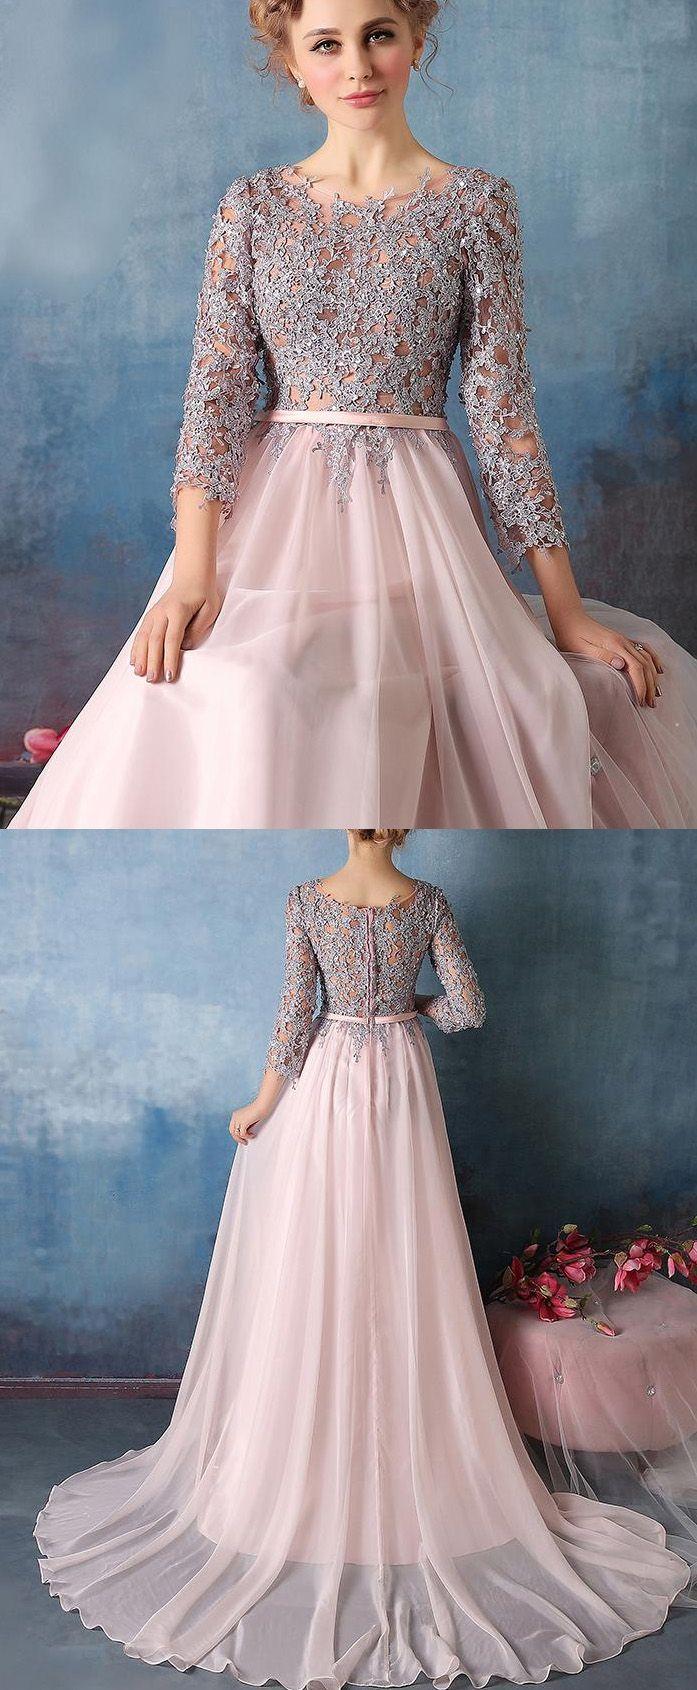 Applique evening dresses pink alineprincess evening dresses long